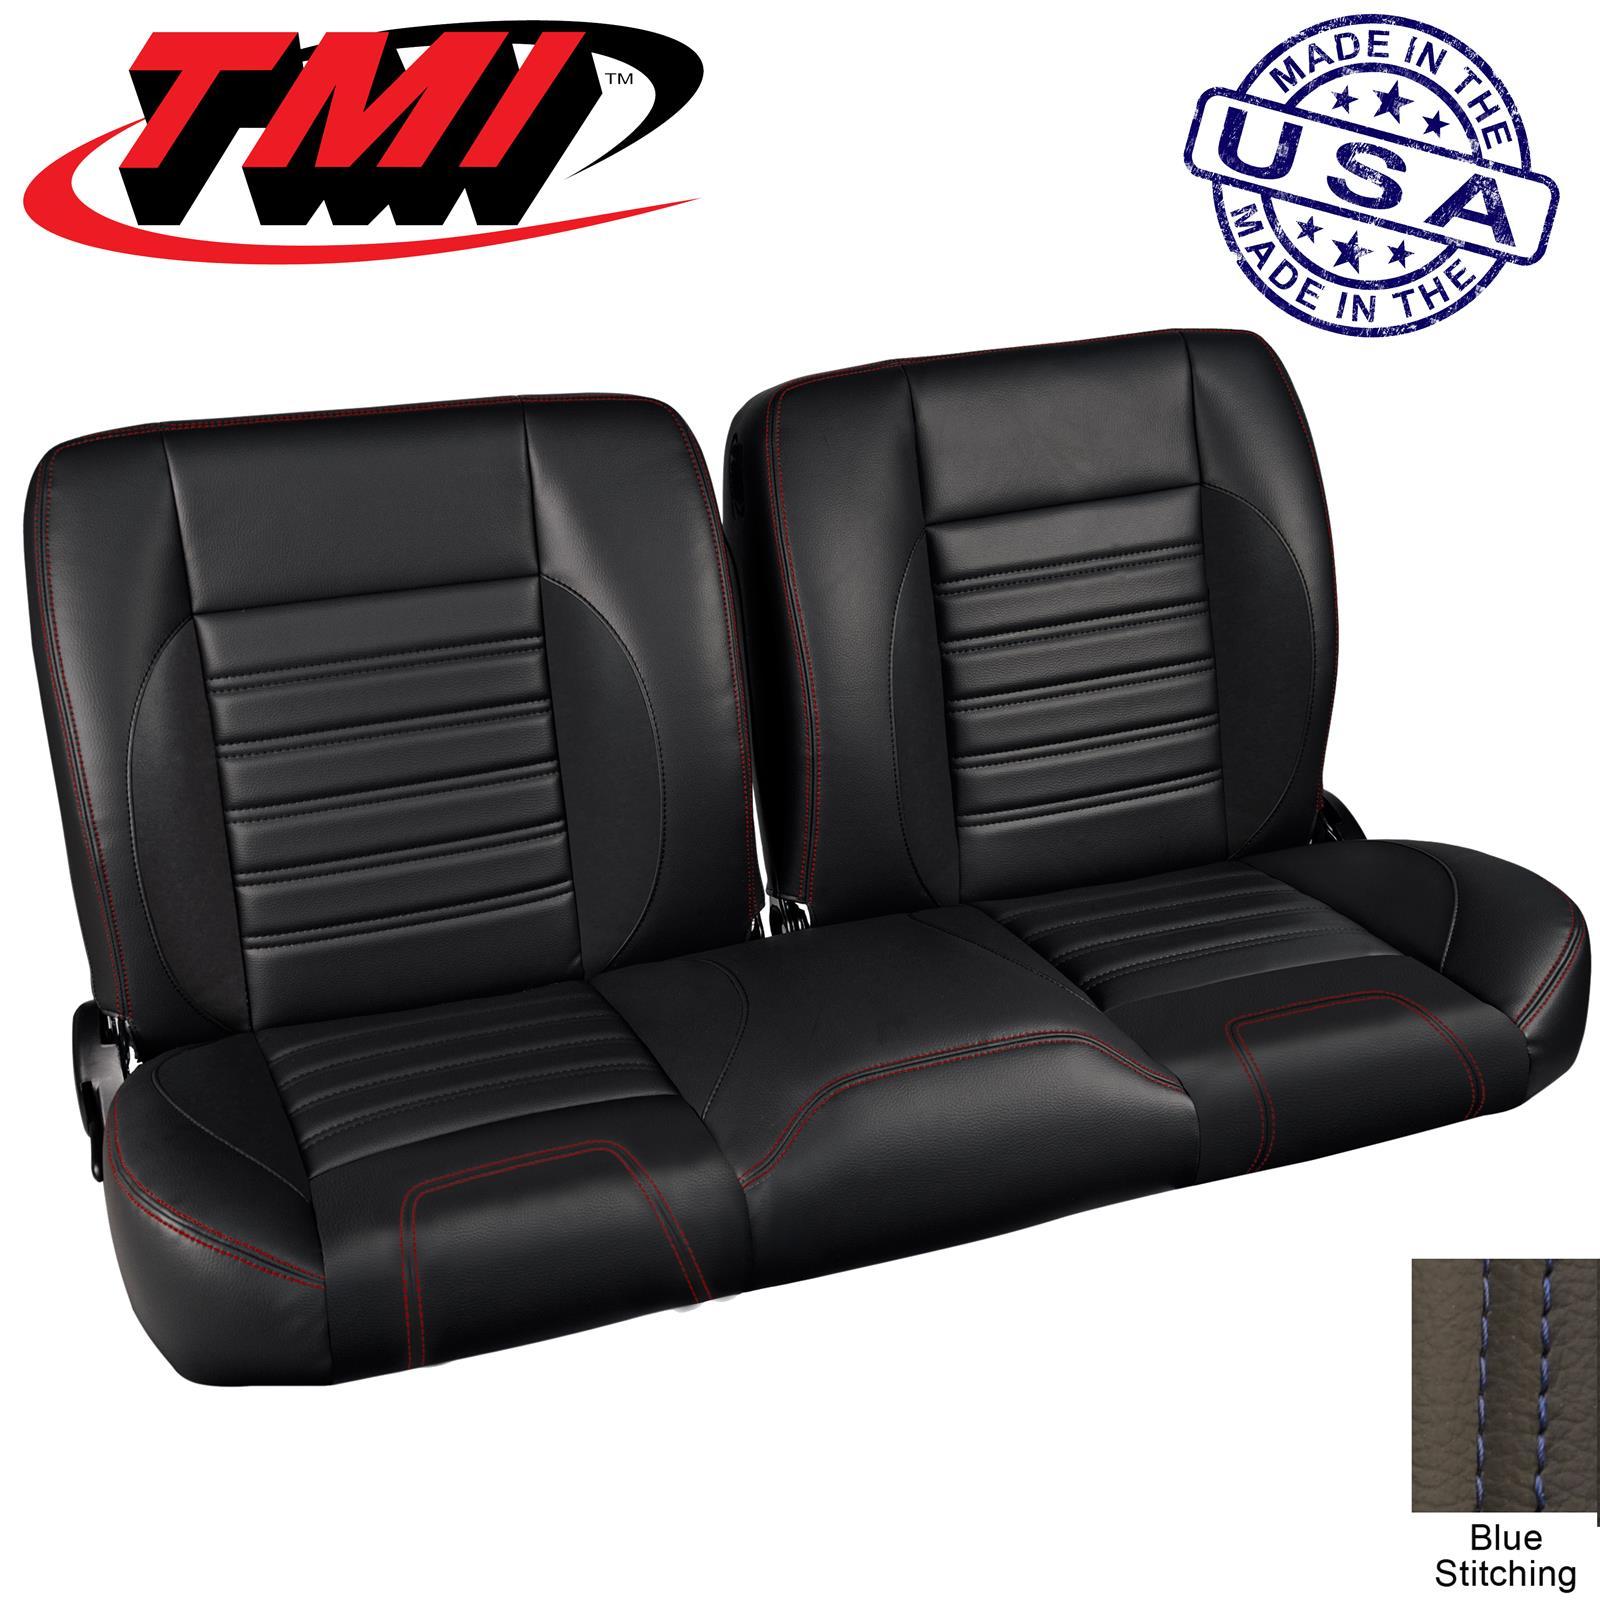 Strange 1965 Chevrolet C10 Pickup Tmi Sport Series Pro Split Back Bench Seats 47 9701 6525 Bs Theyellowbook Wood Chair Design Ideas Theyellowbookinfo